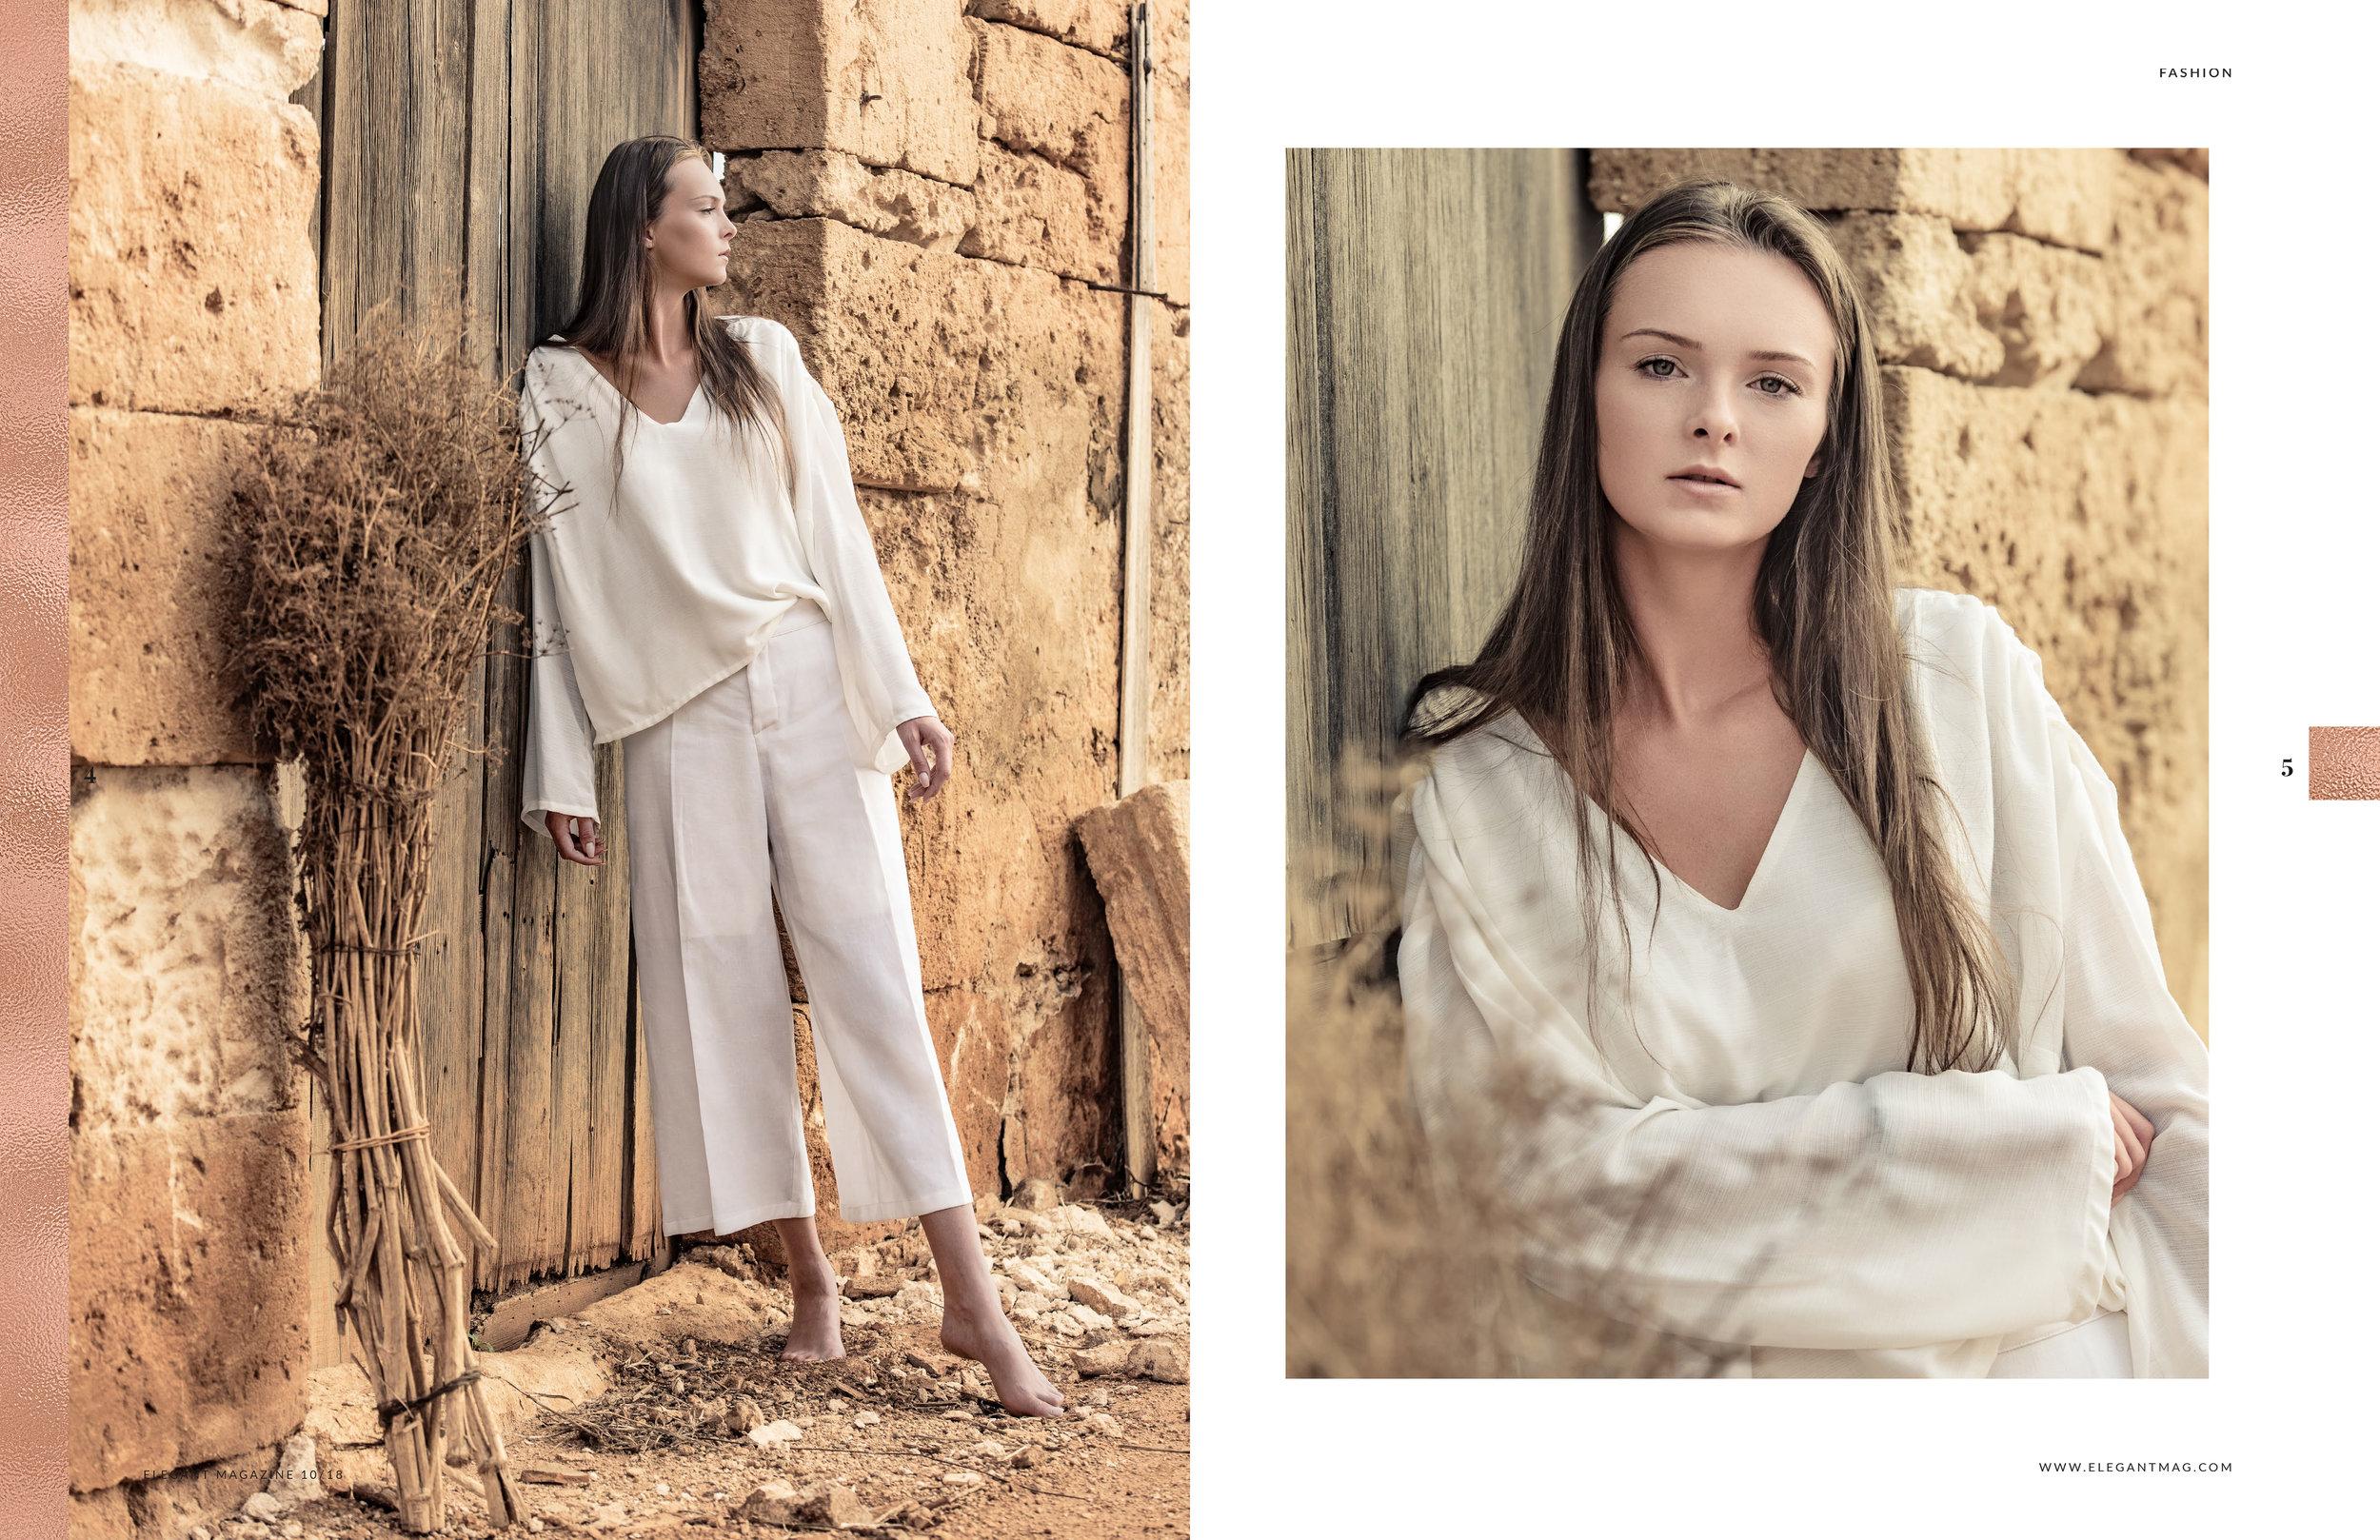 ELEGANT Oct2018-Fashion18 64-65_hiQ.jpg